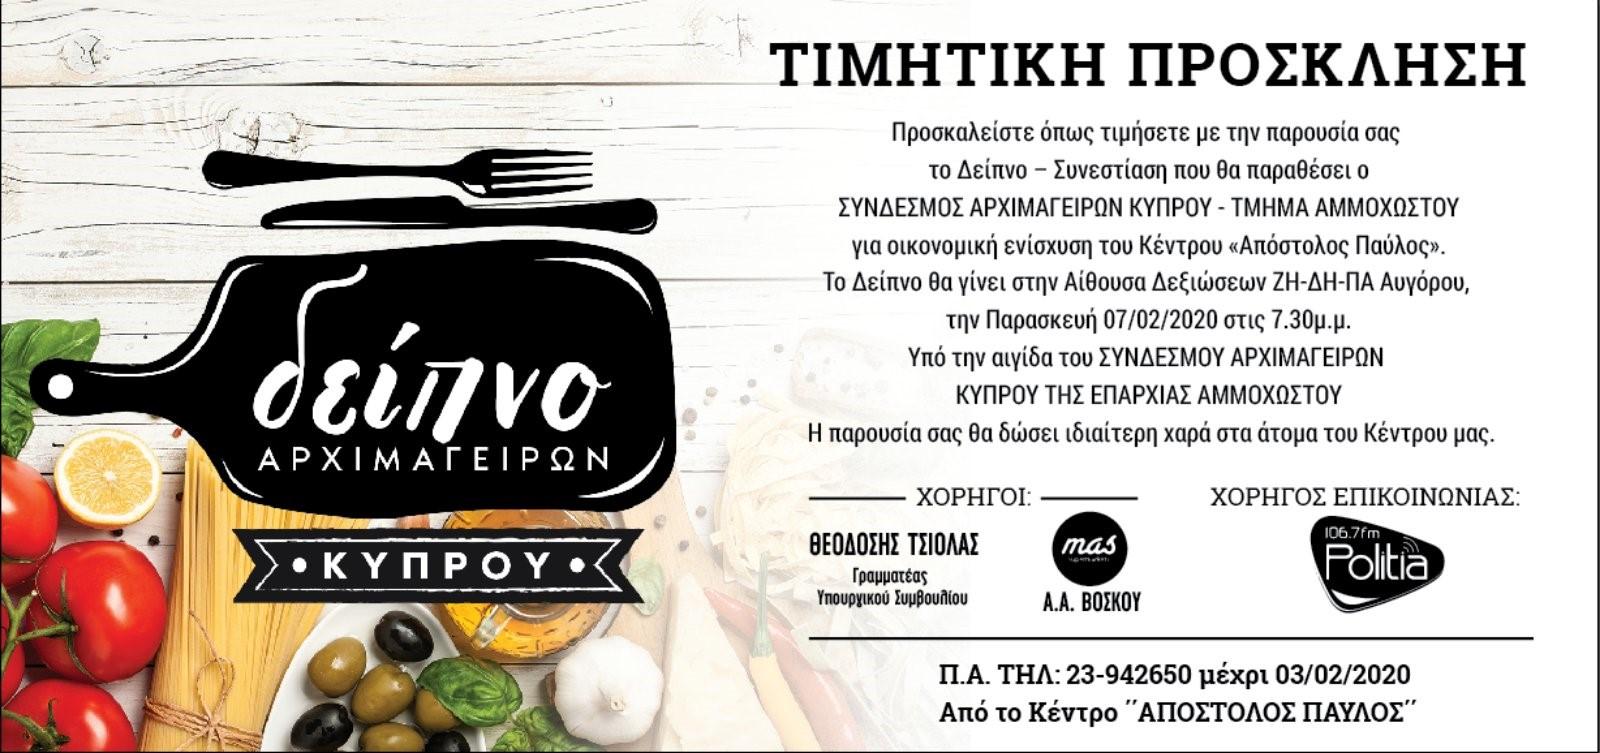 Cyprus Chefs Association - Charity dinner, February 2020, Invitation